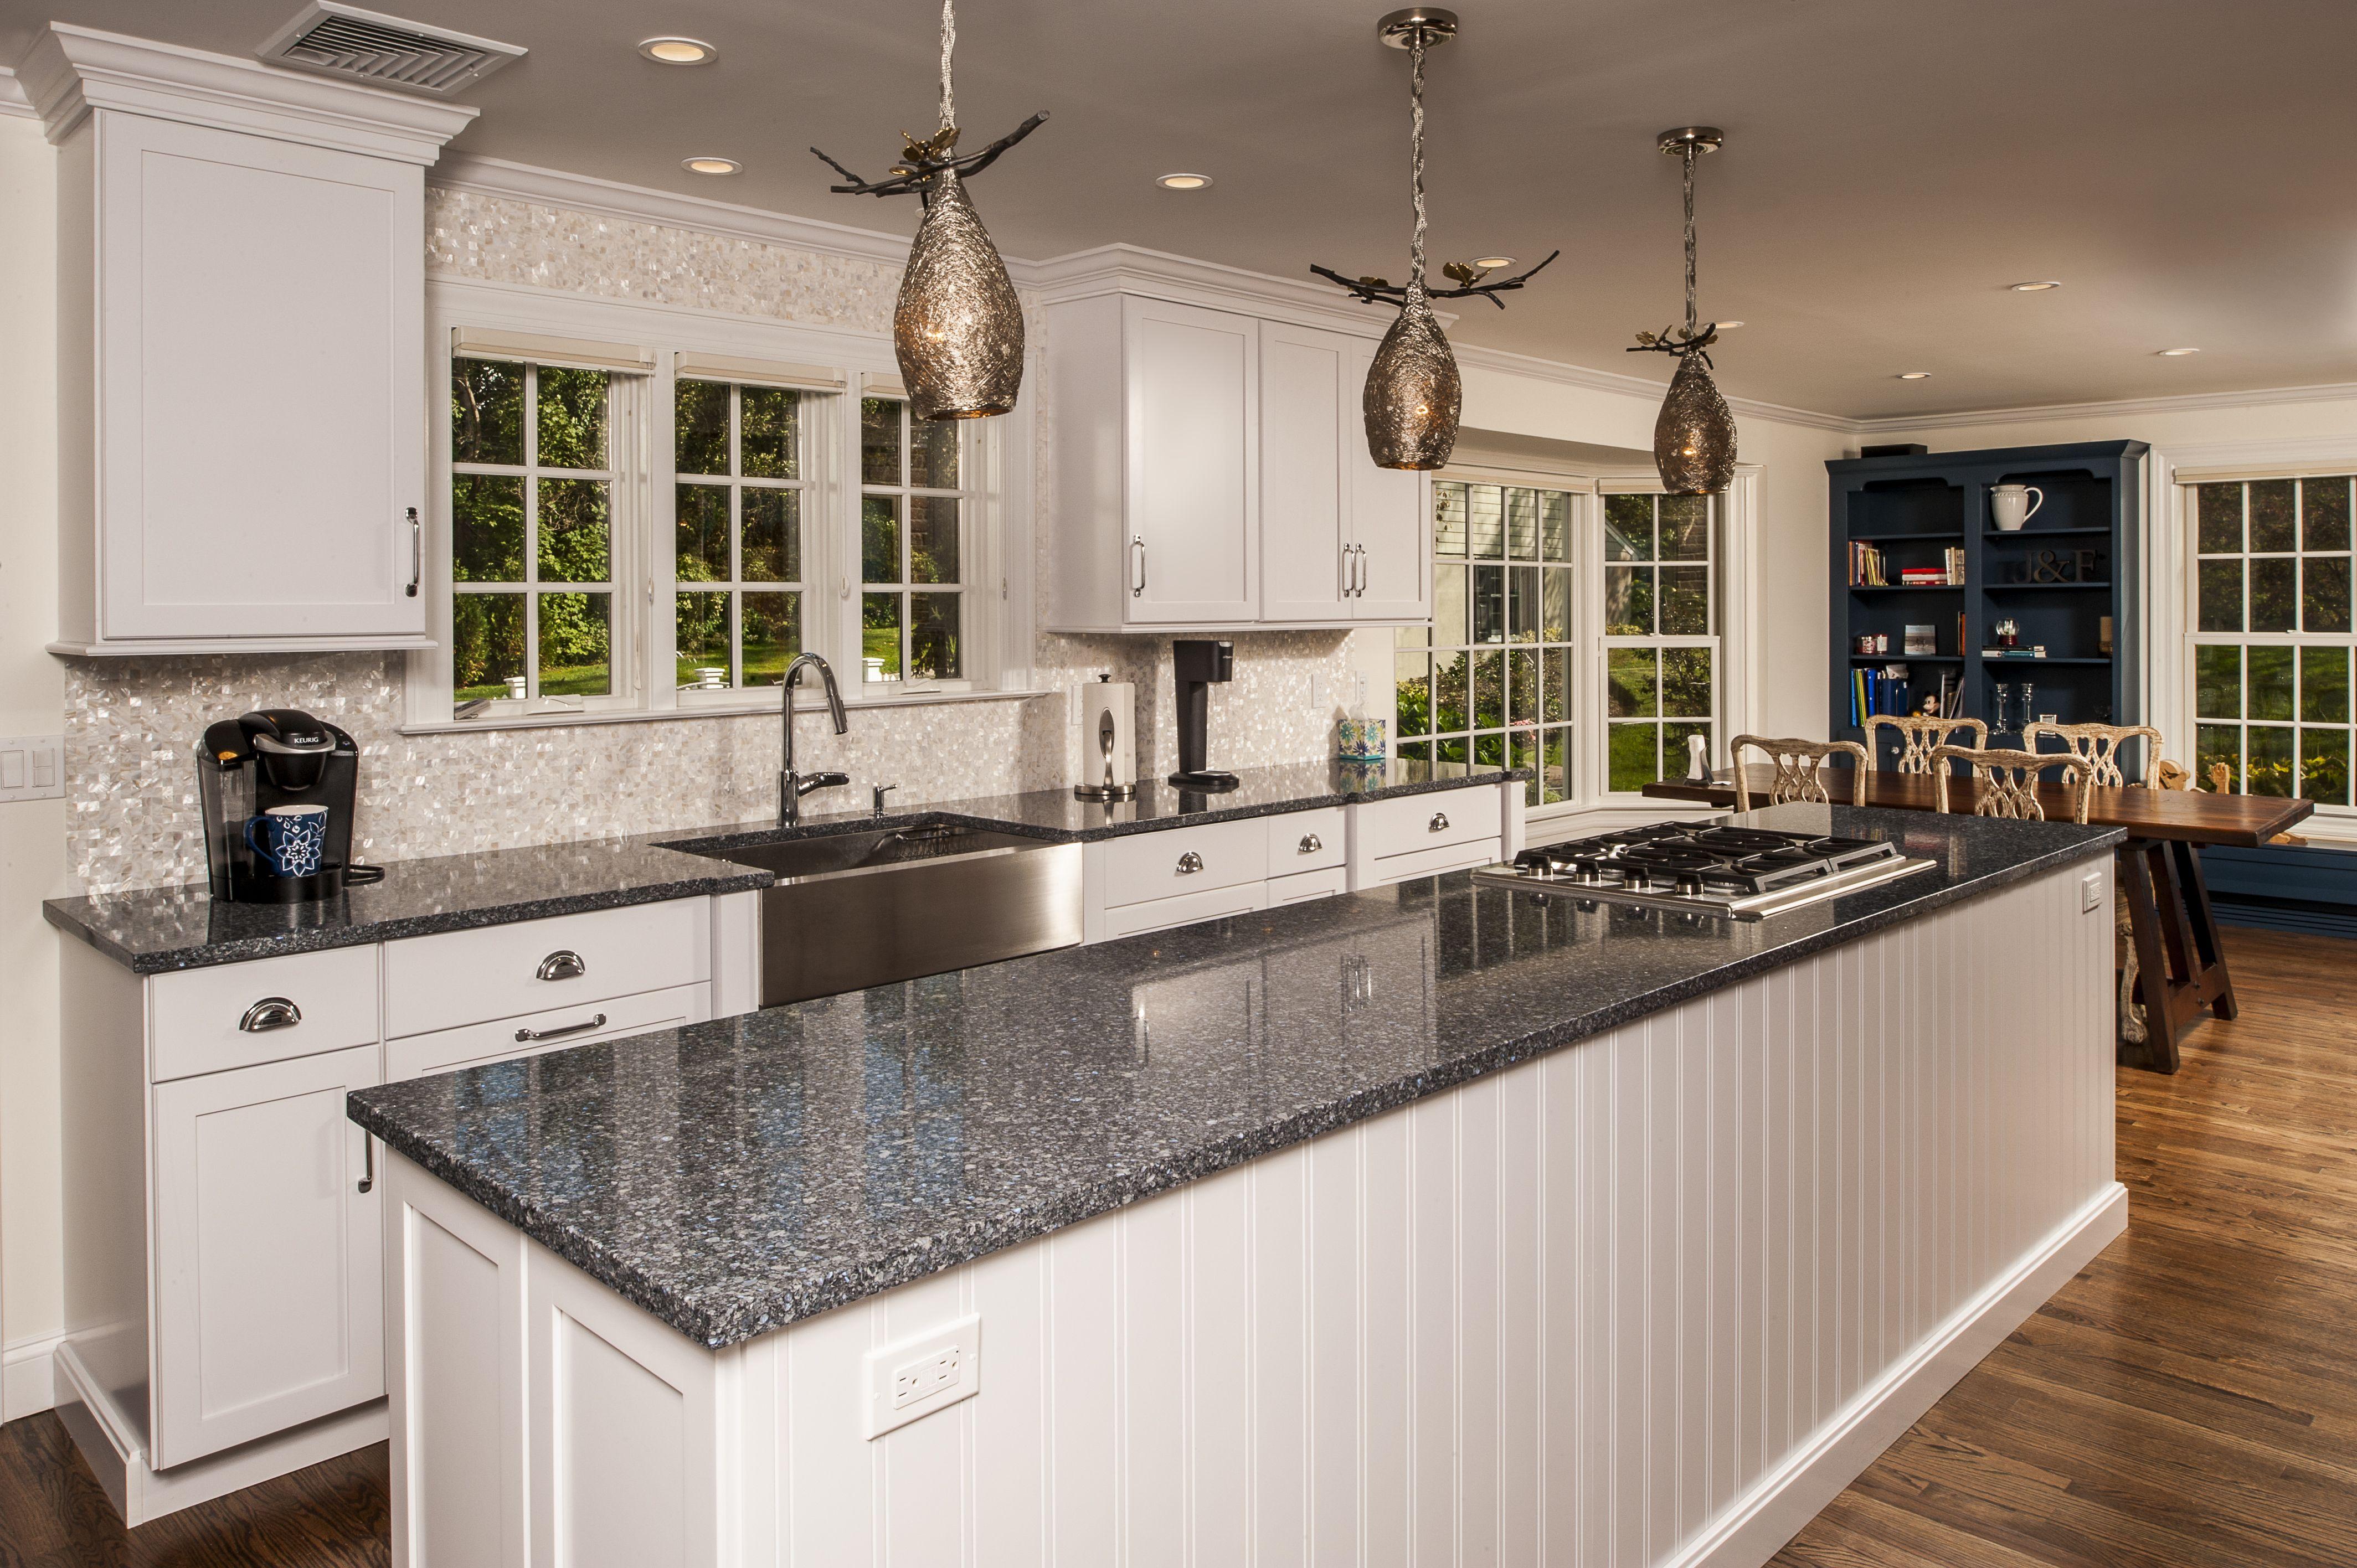 Stainless Steel Farmhouse Sink White Kitchen With Center Island